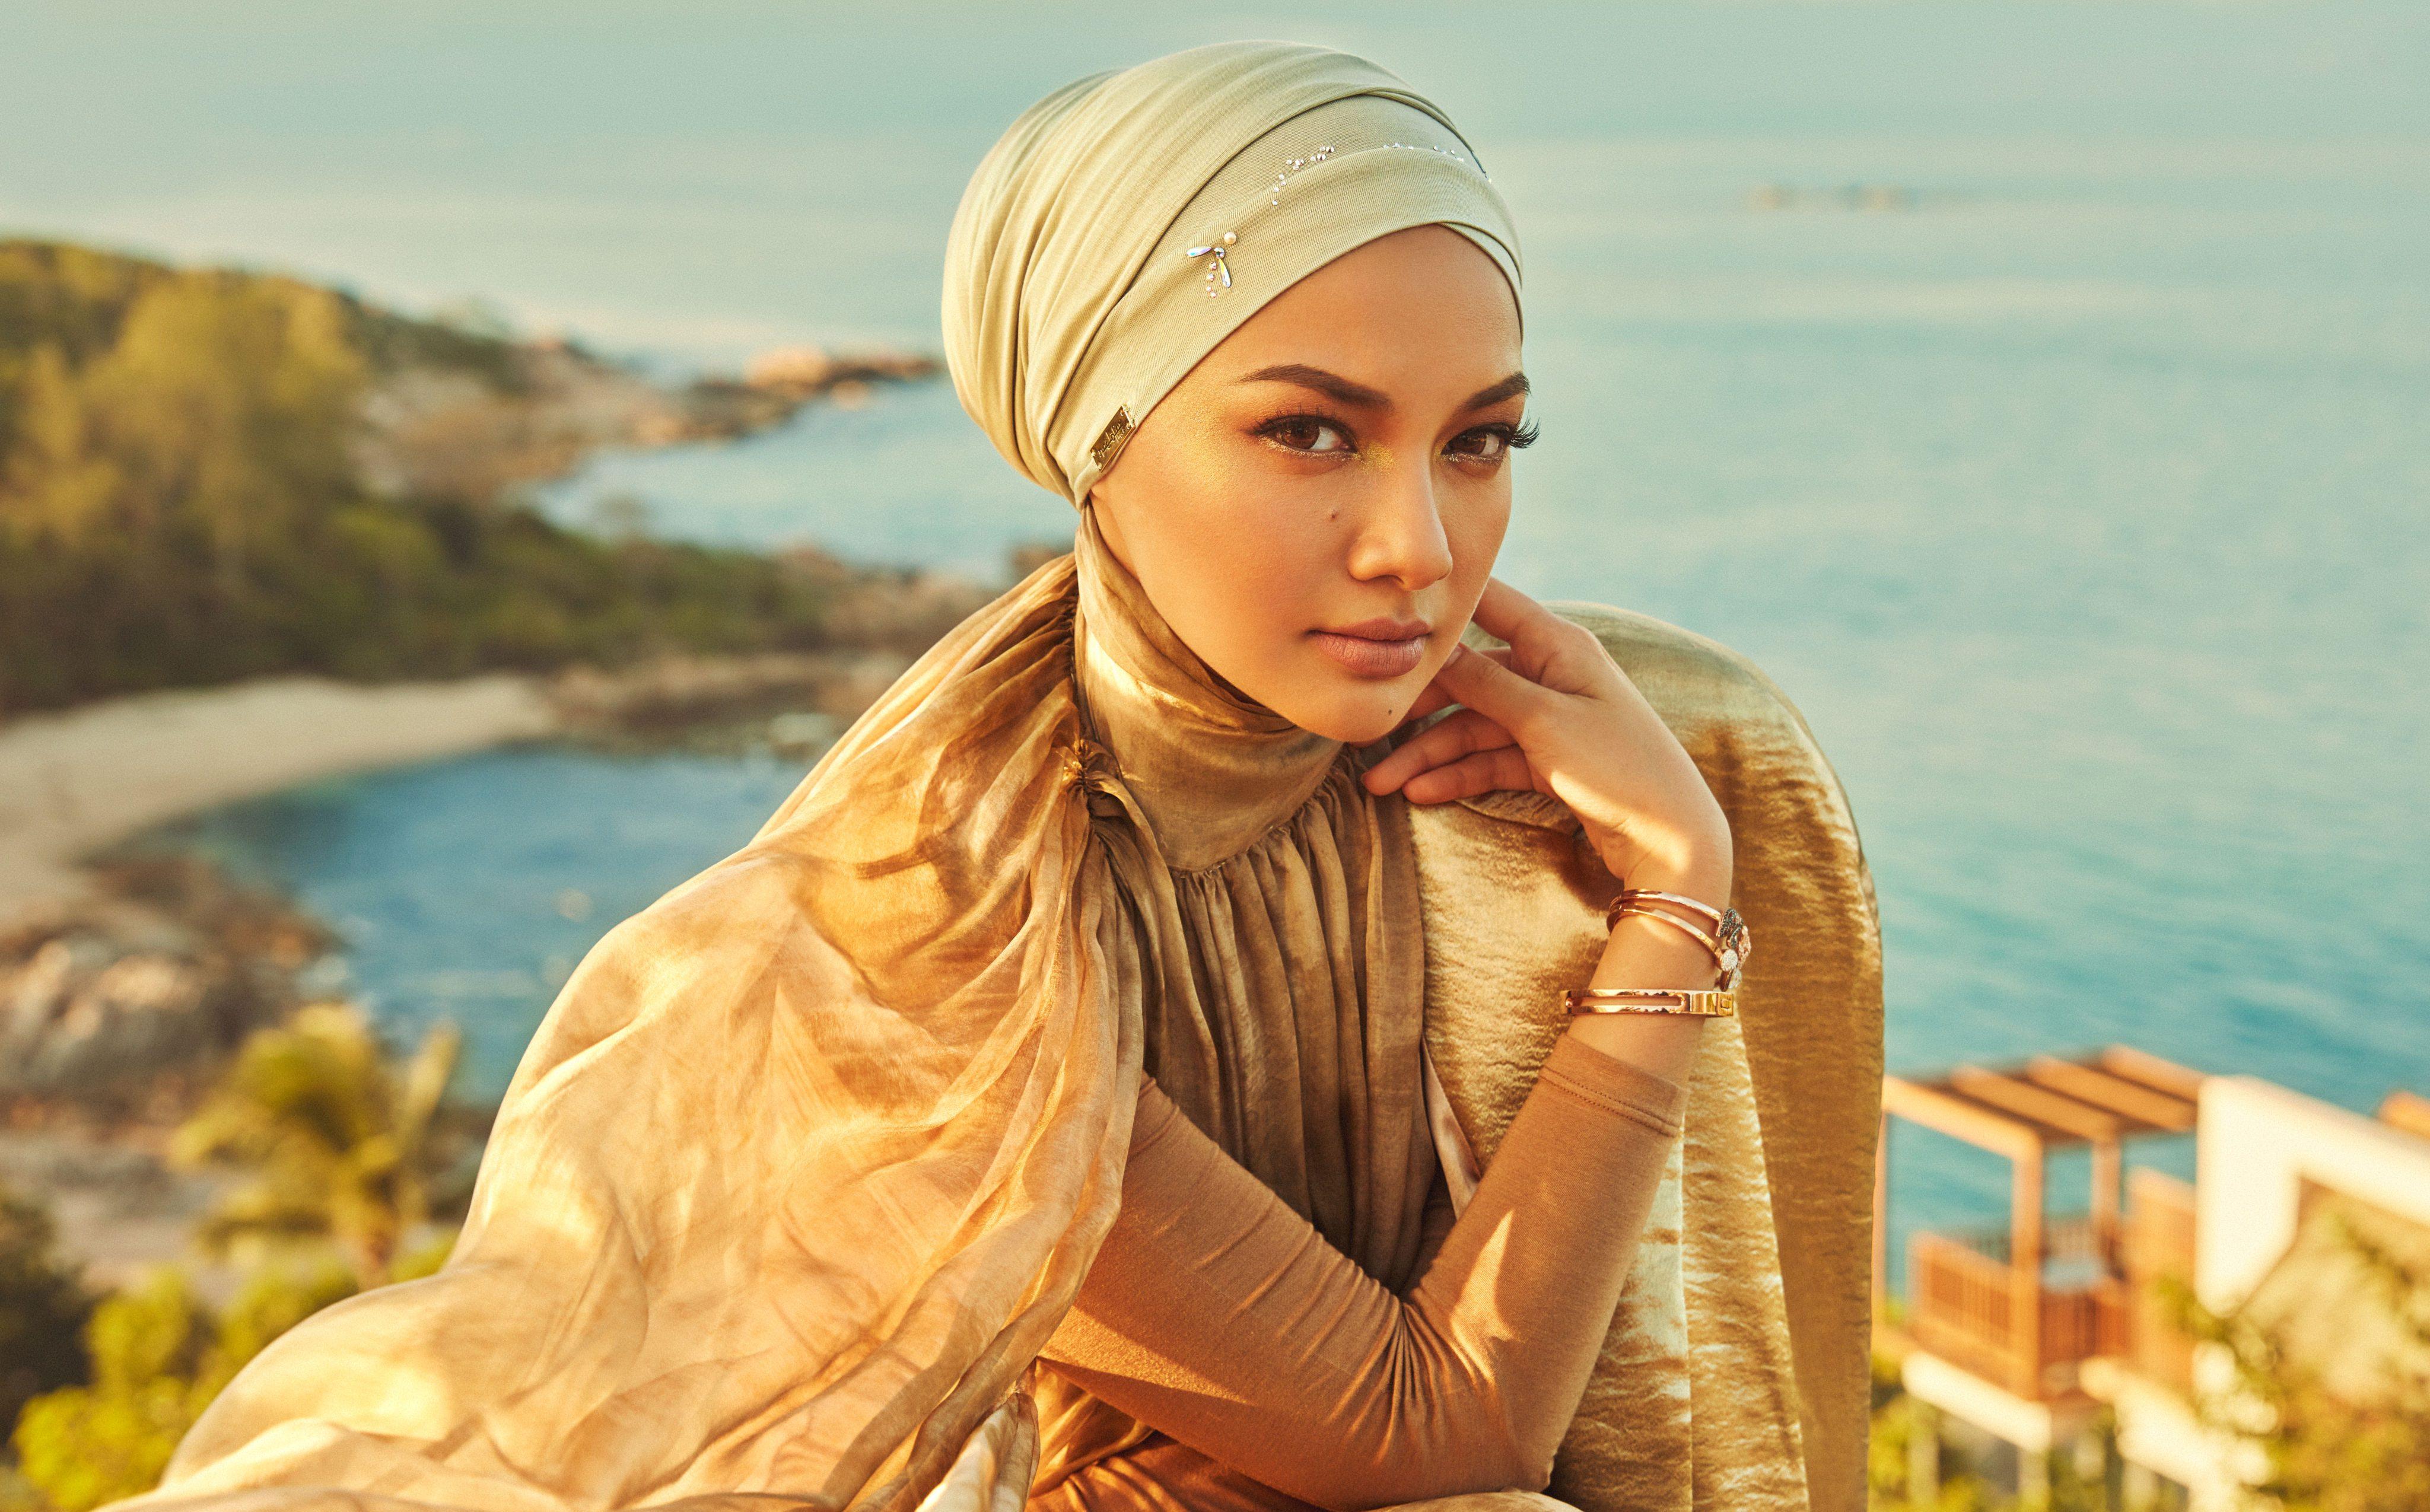 malaysian beauty 1575664756 - Malaysian Beauty -